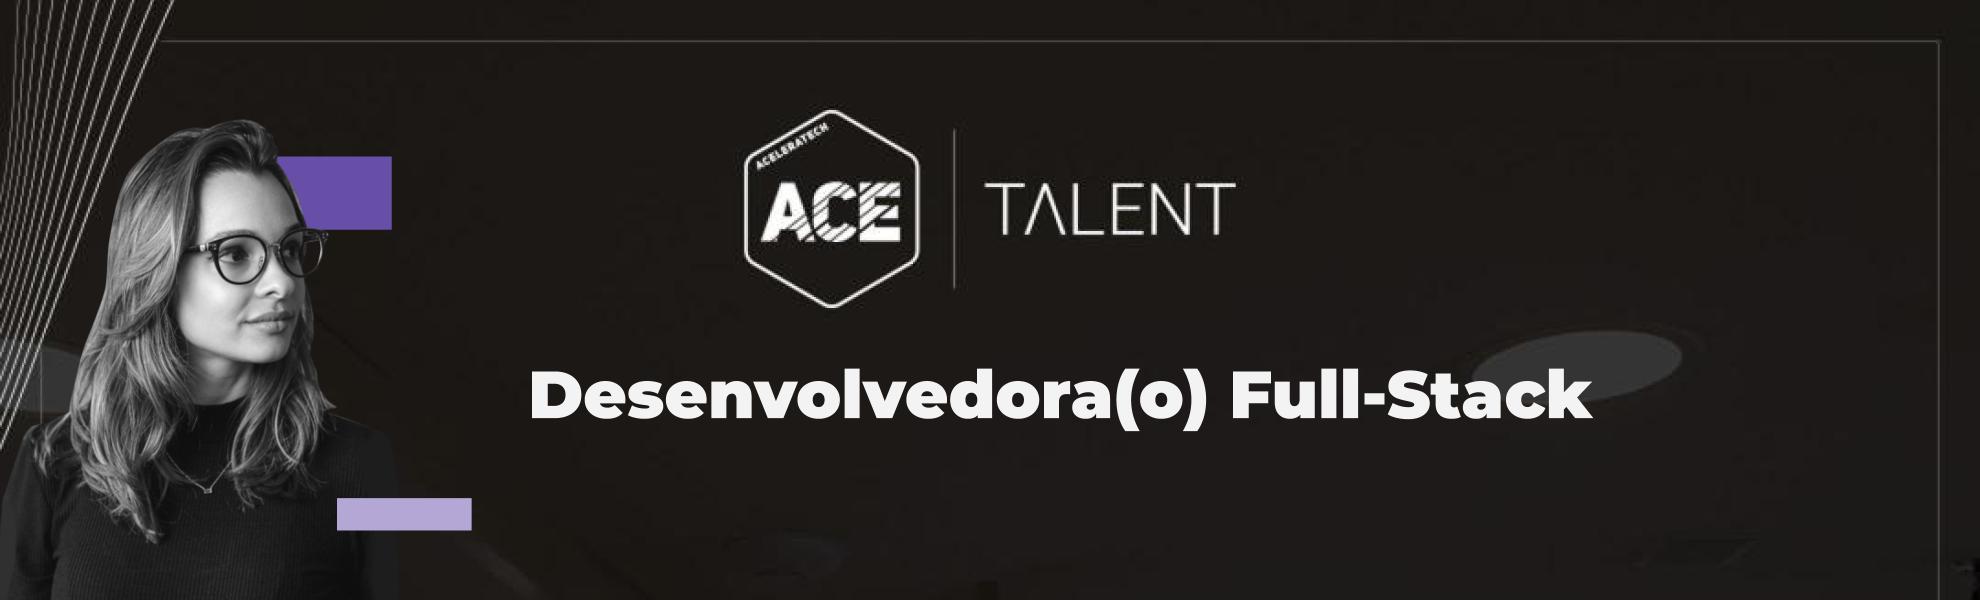 Desenvolvedora(o) Full-Stack